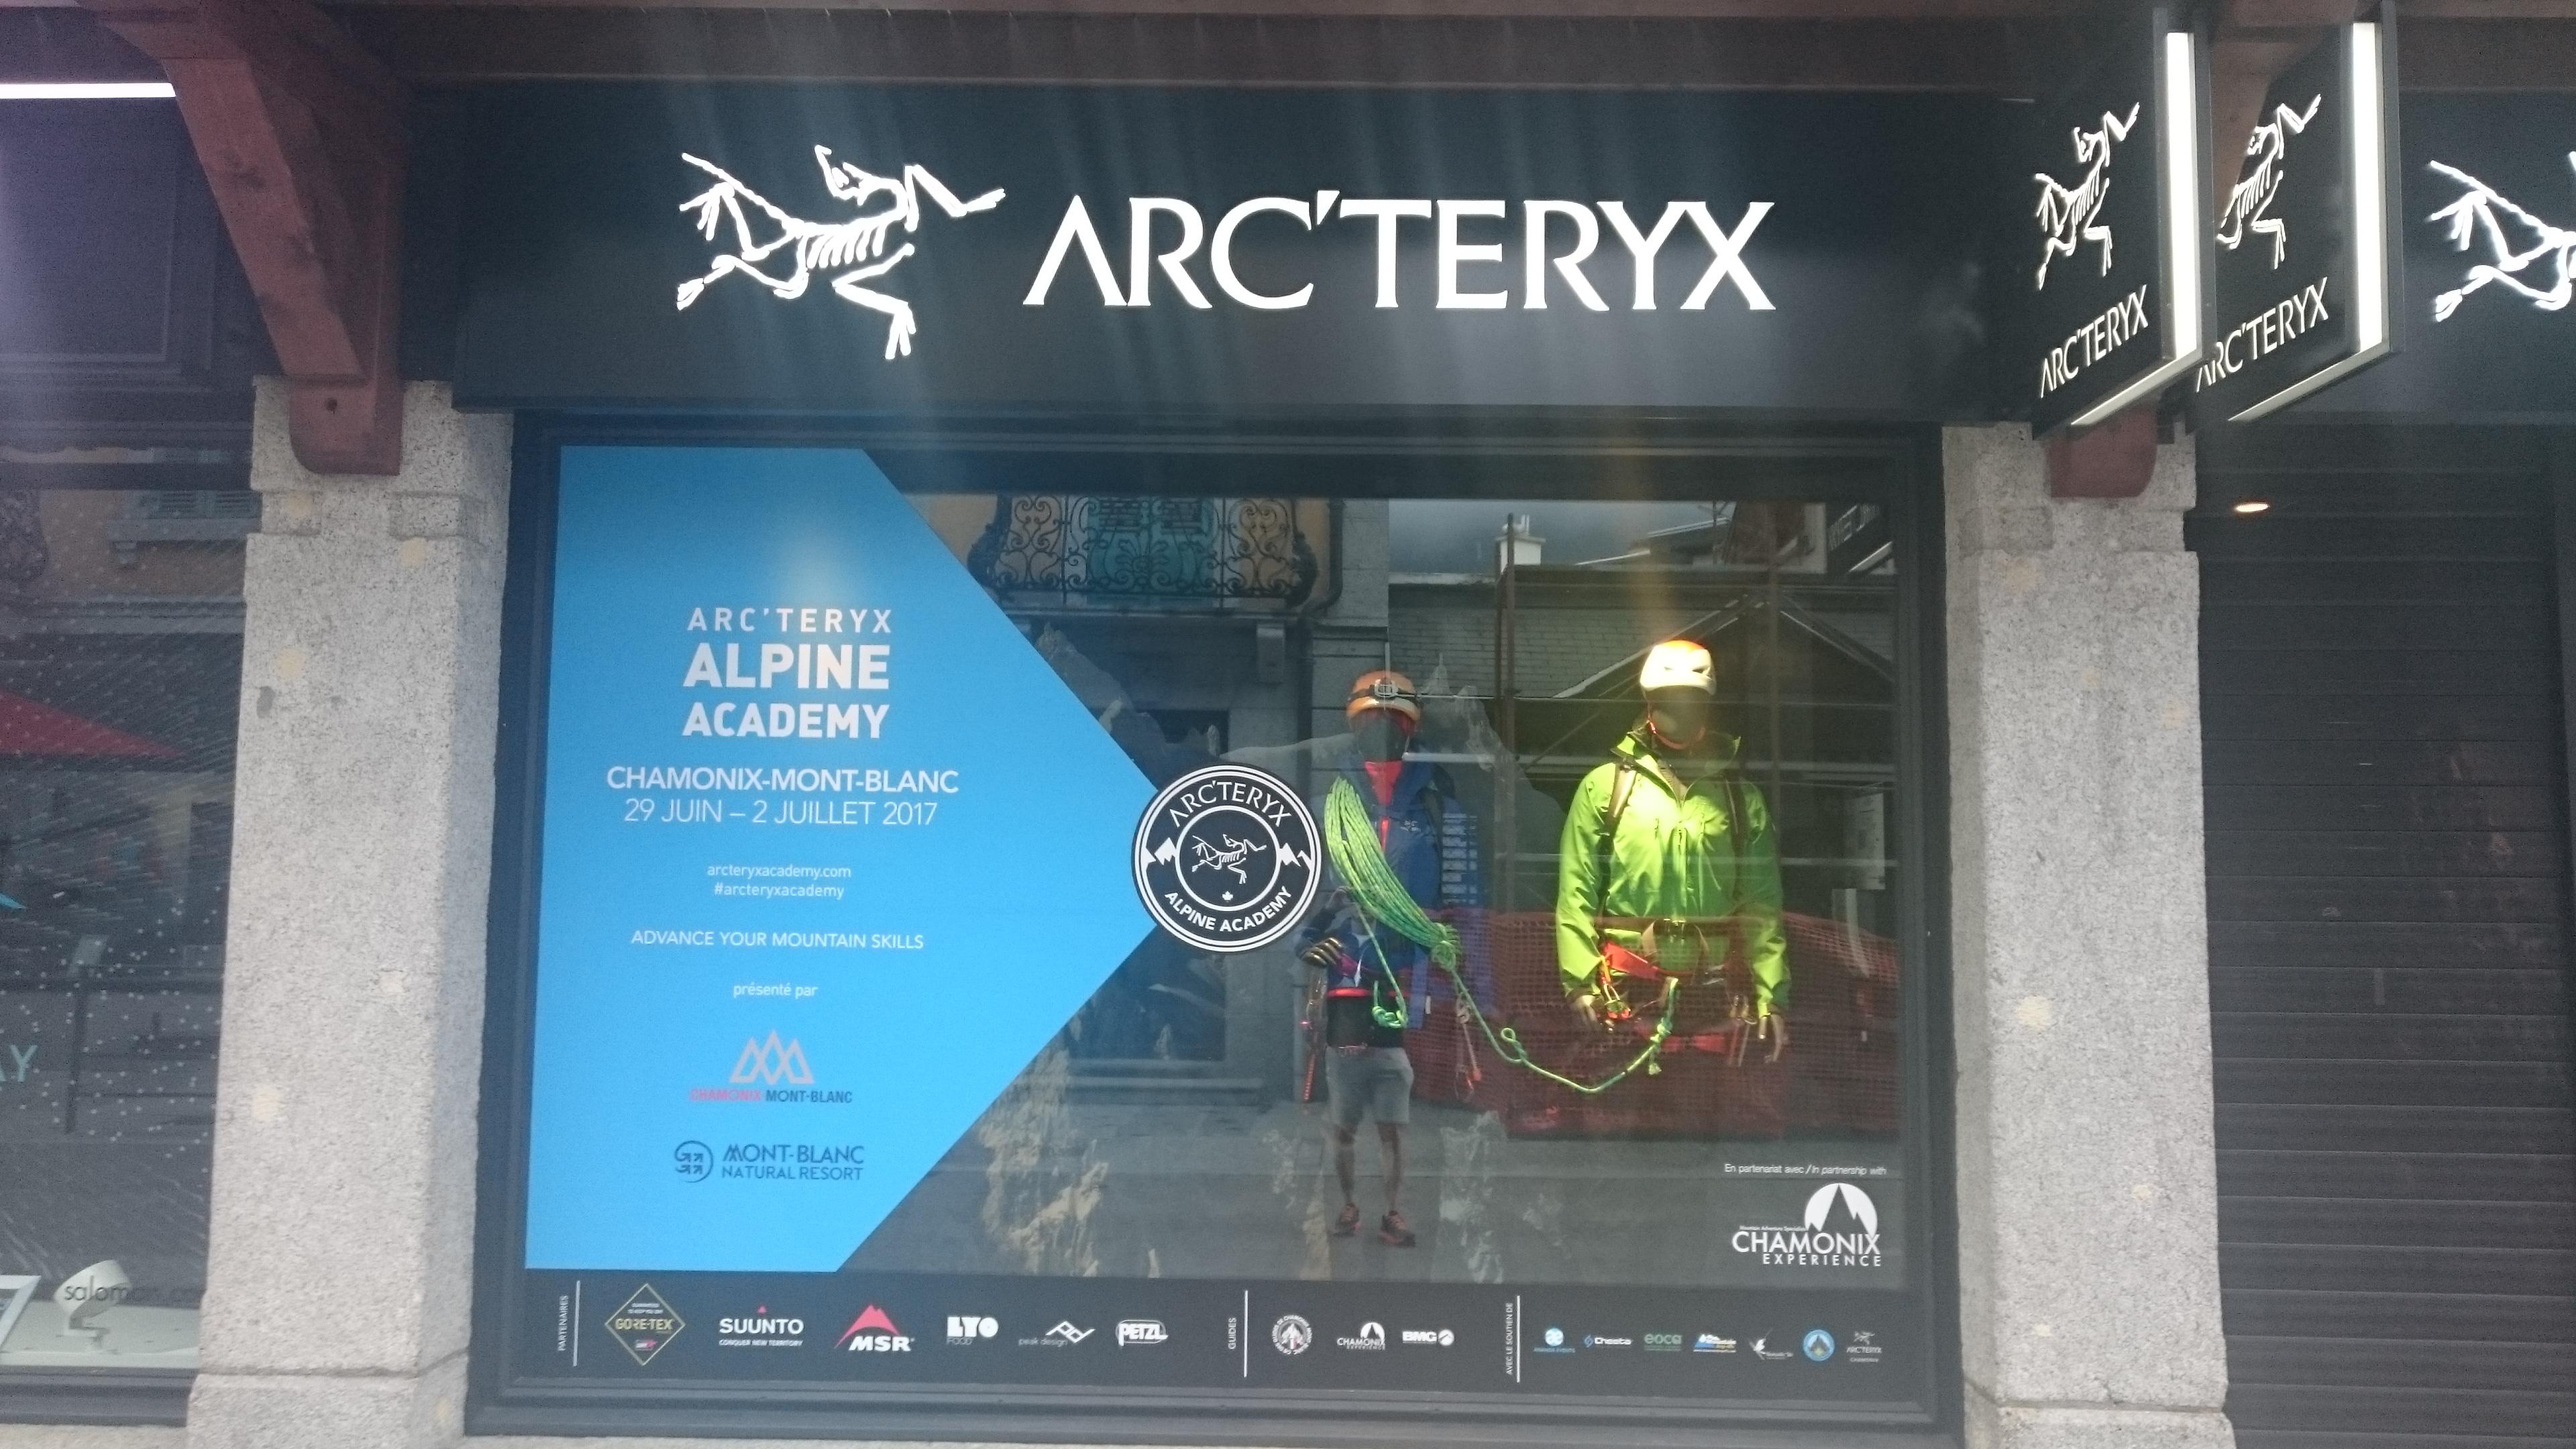 It's the Arc'teryx Alpine Academy this Thursday to Sunday